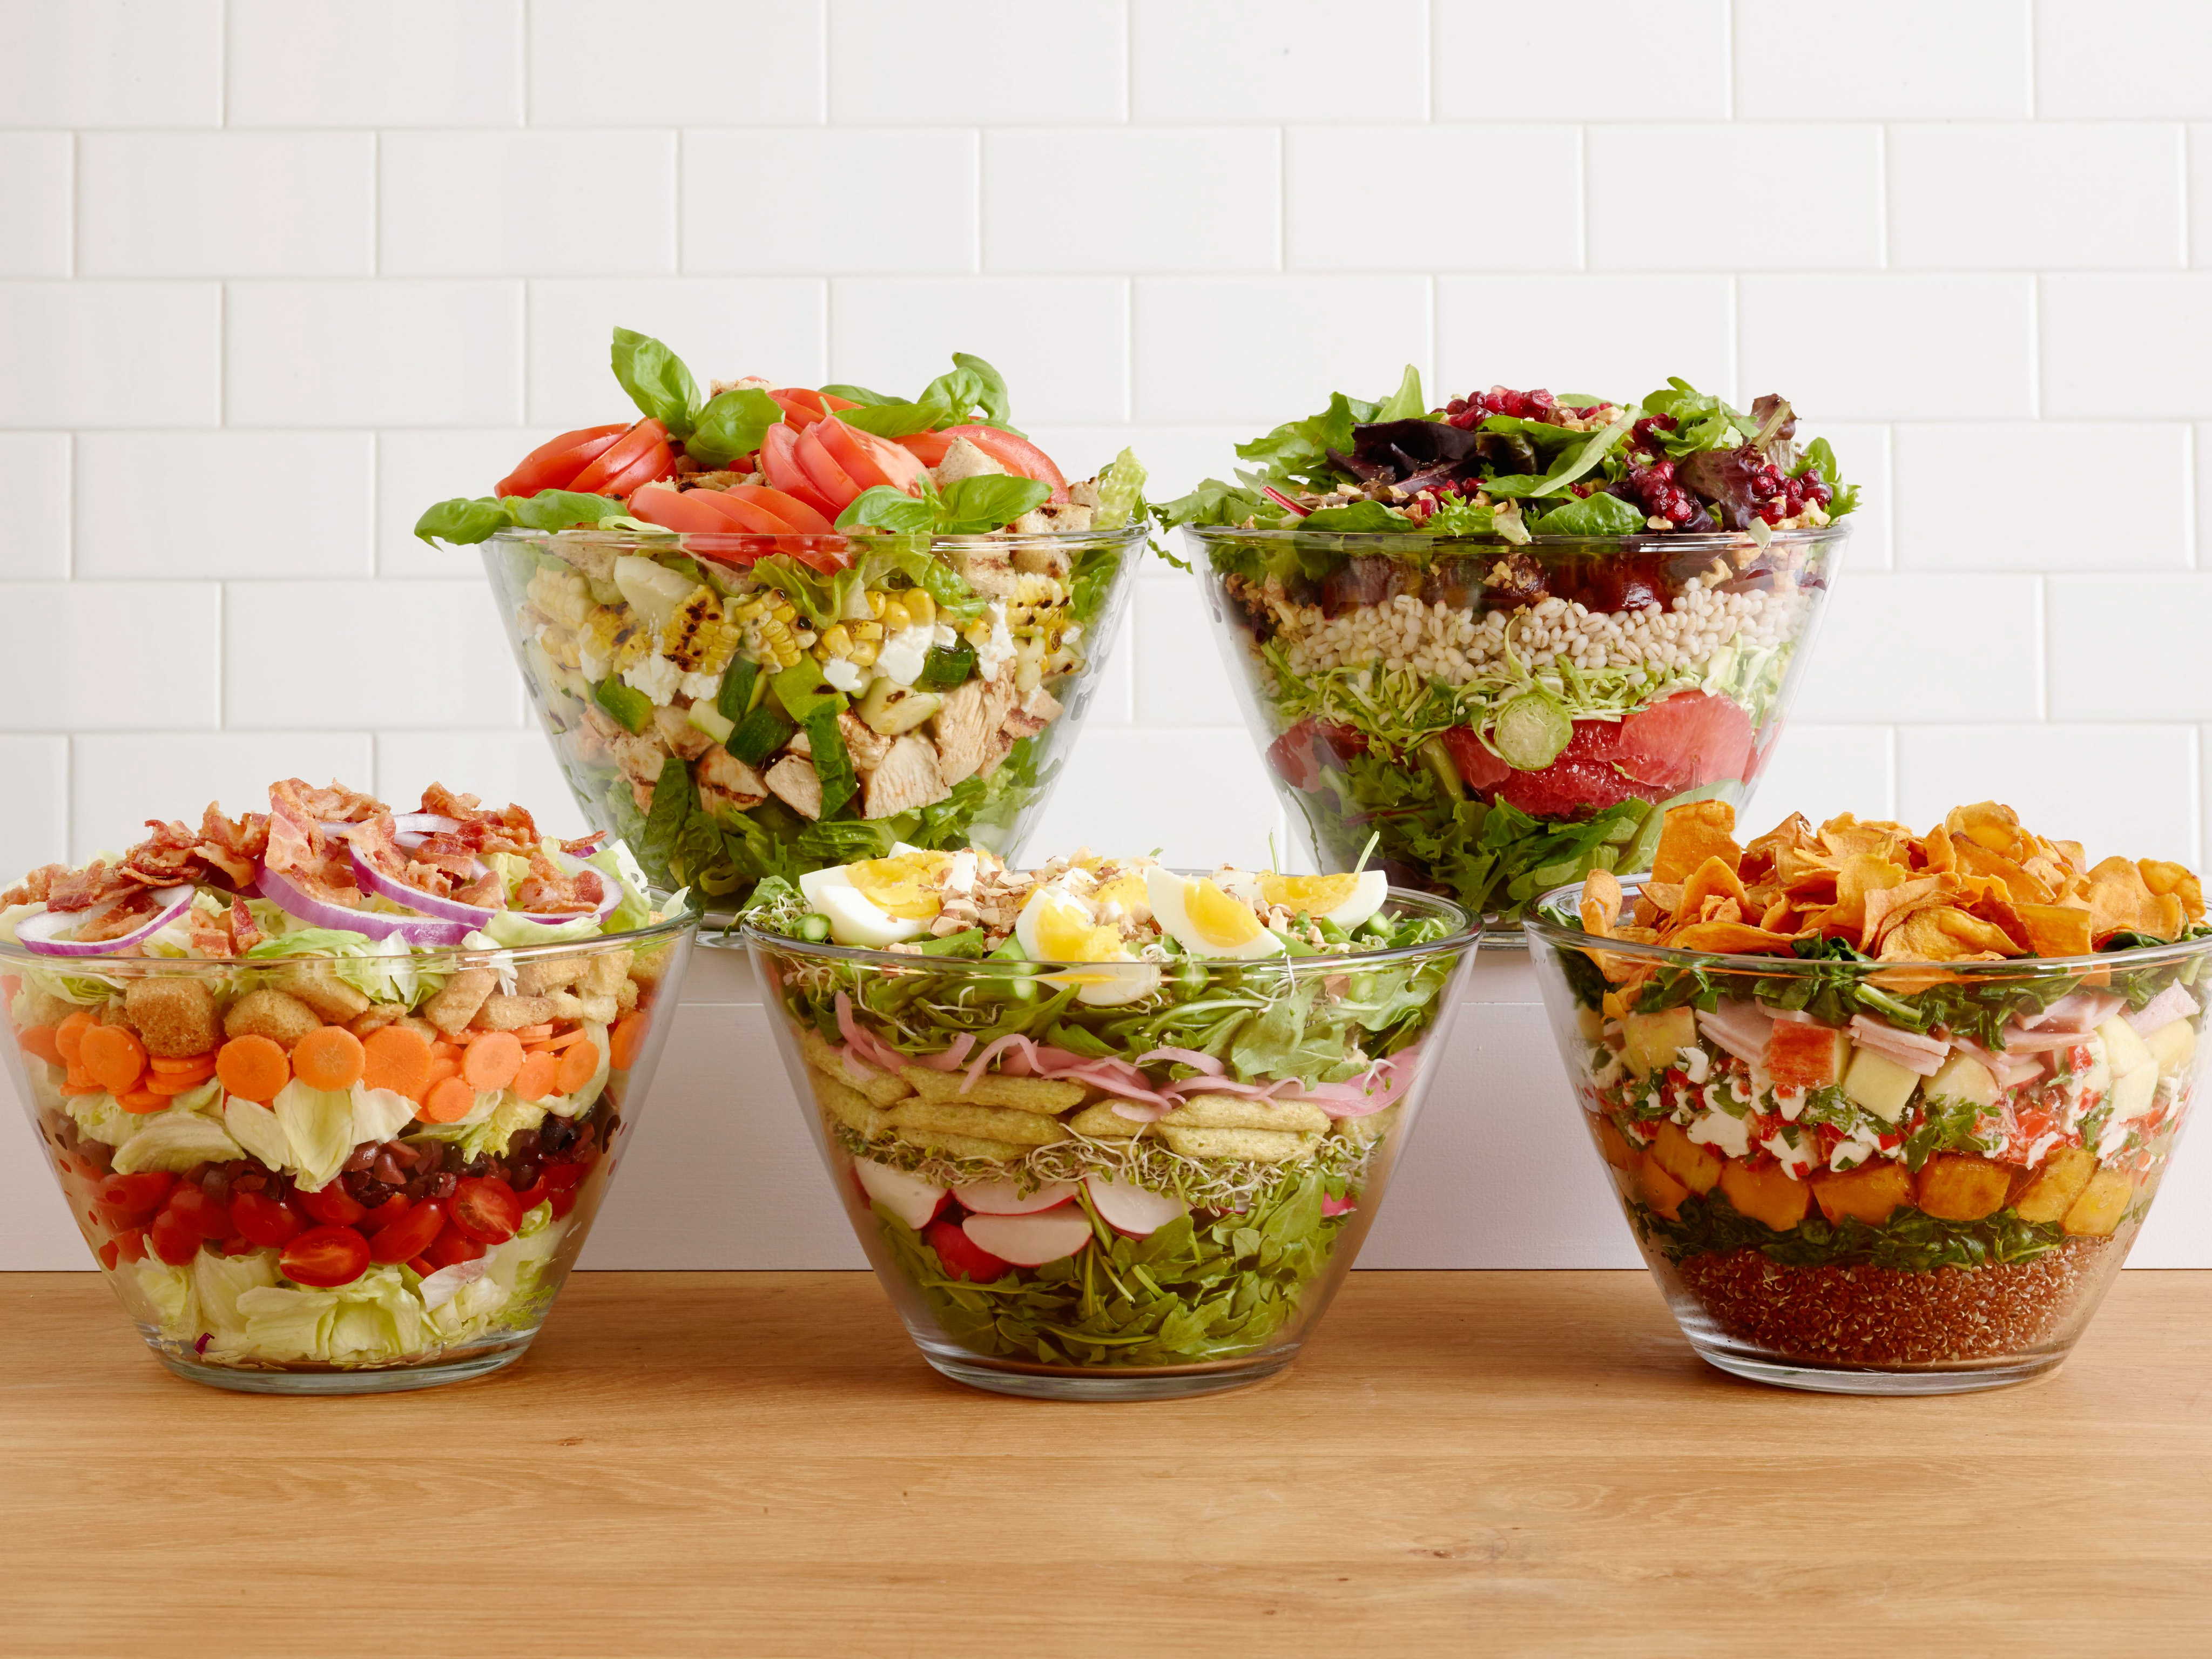 fnk_layered-salads-opener_s4x3